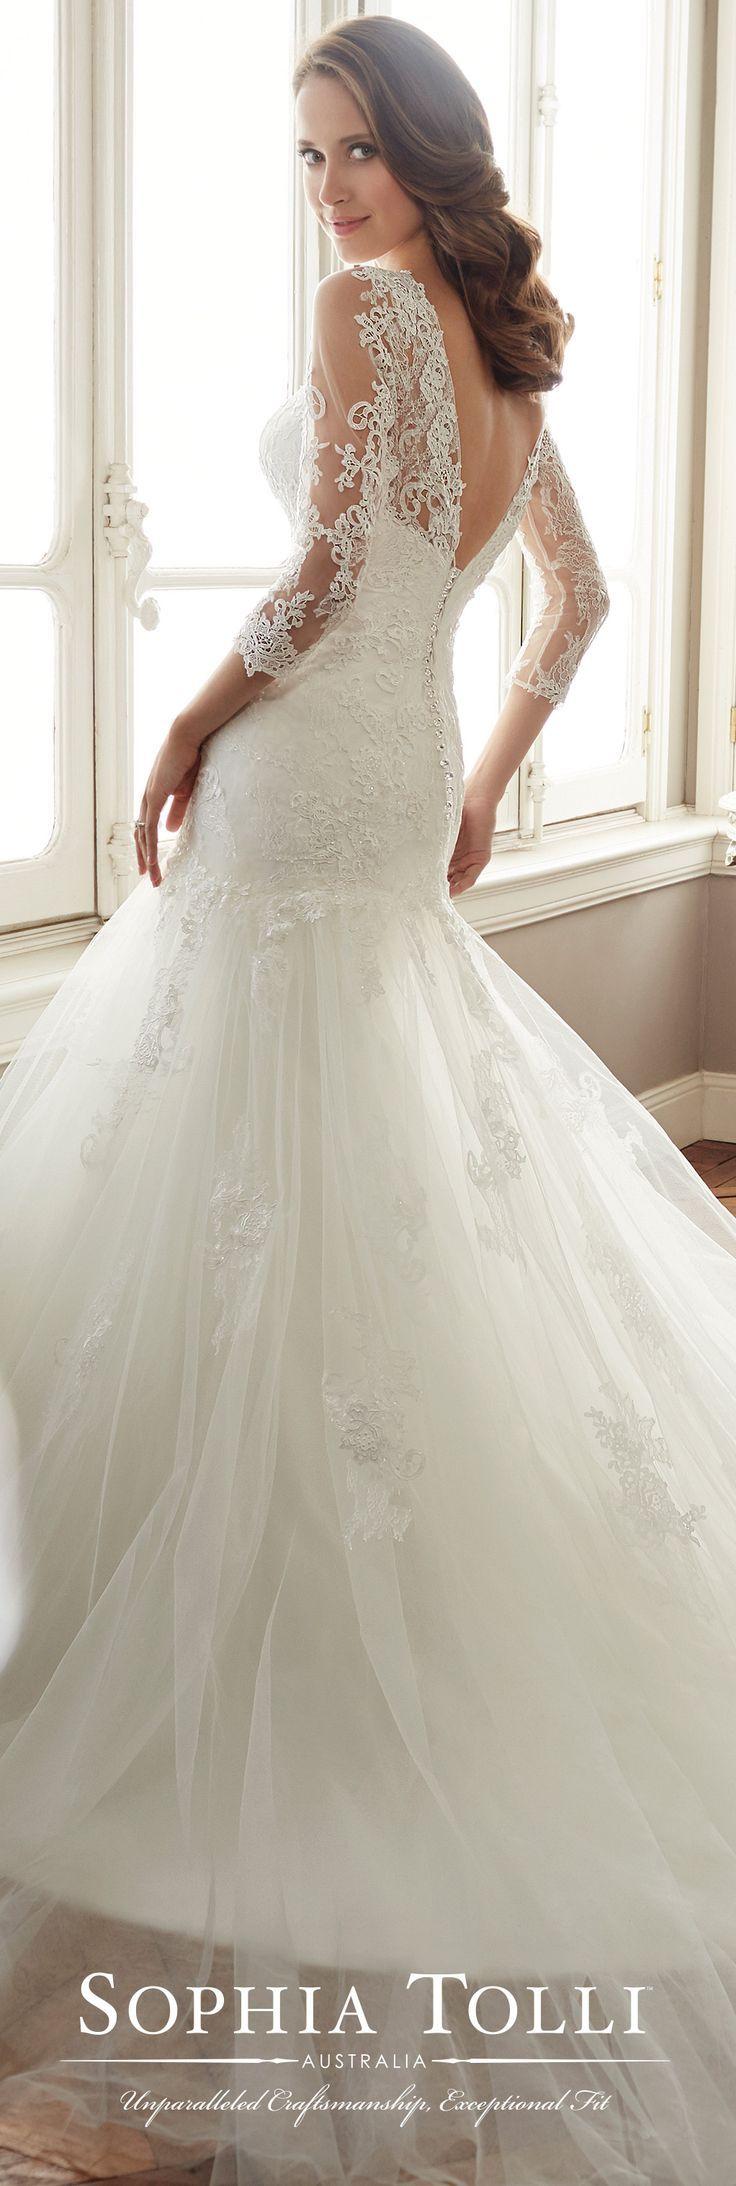 Sophia tolli spring wedding gown collection style no y